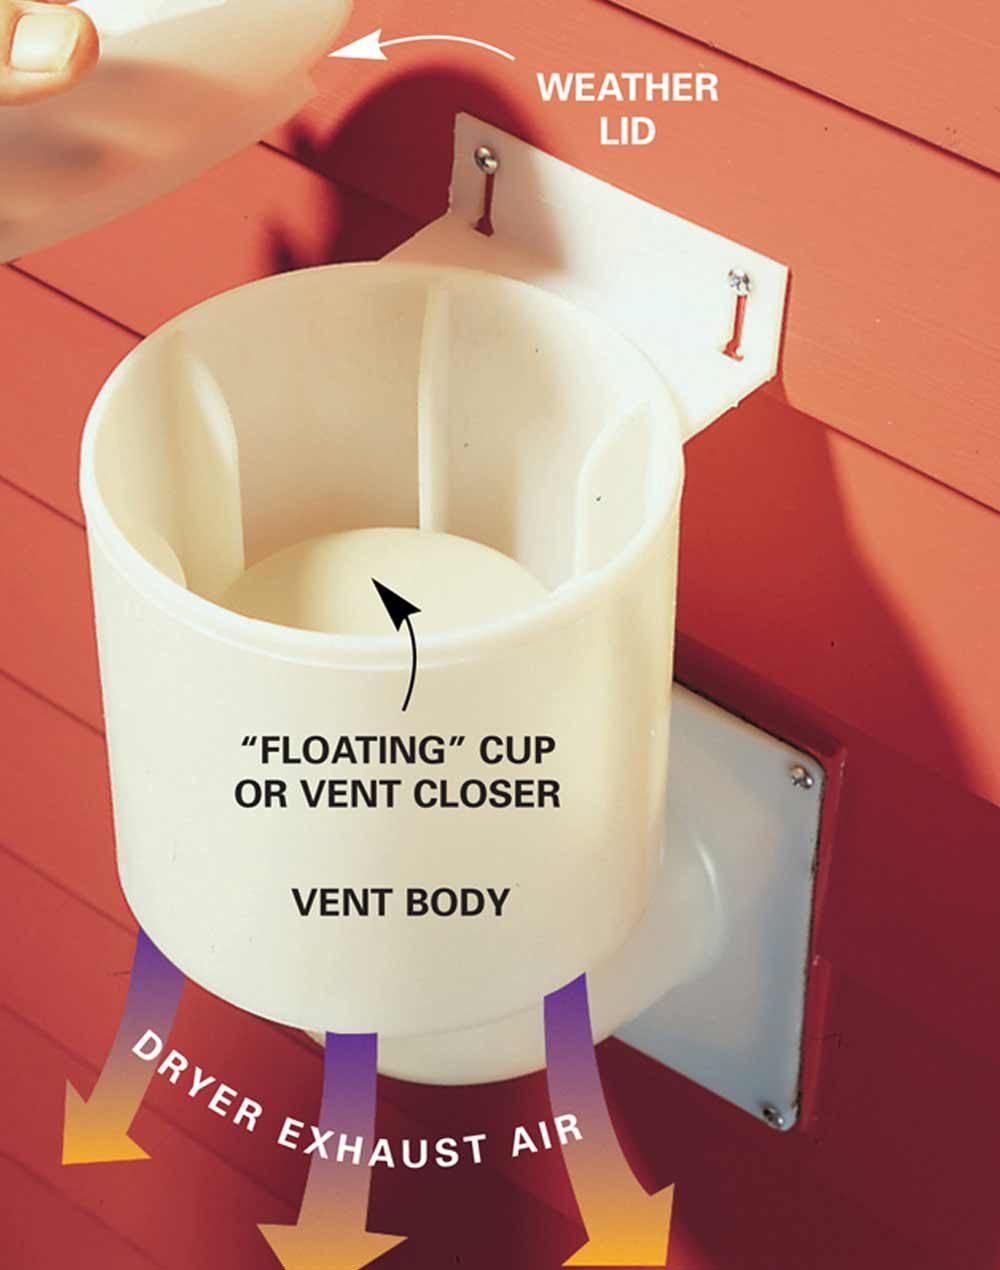 Install Airtight Dryer Vent